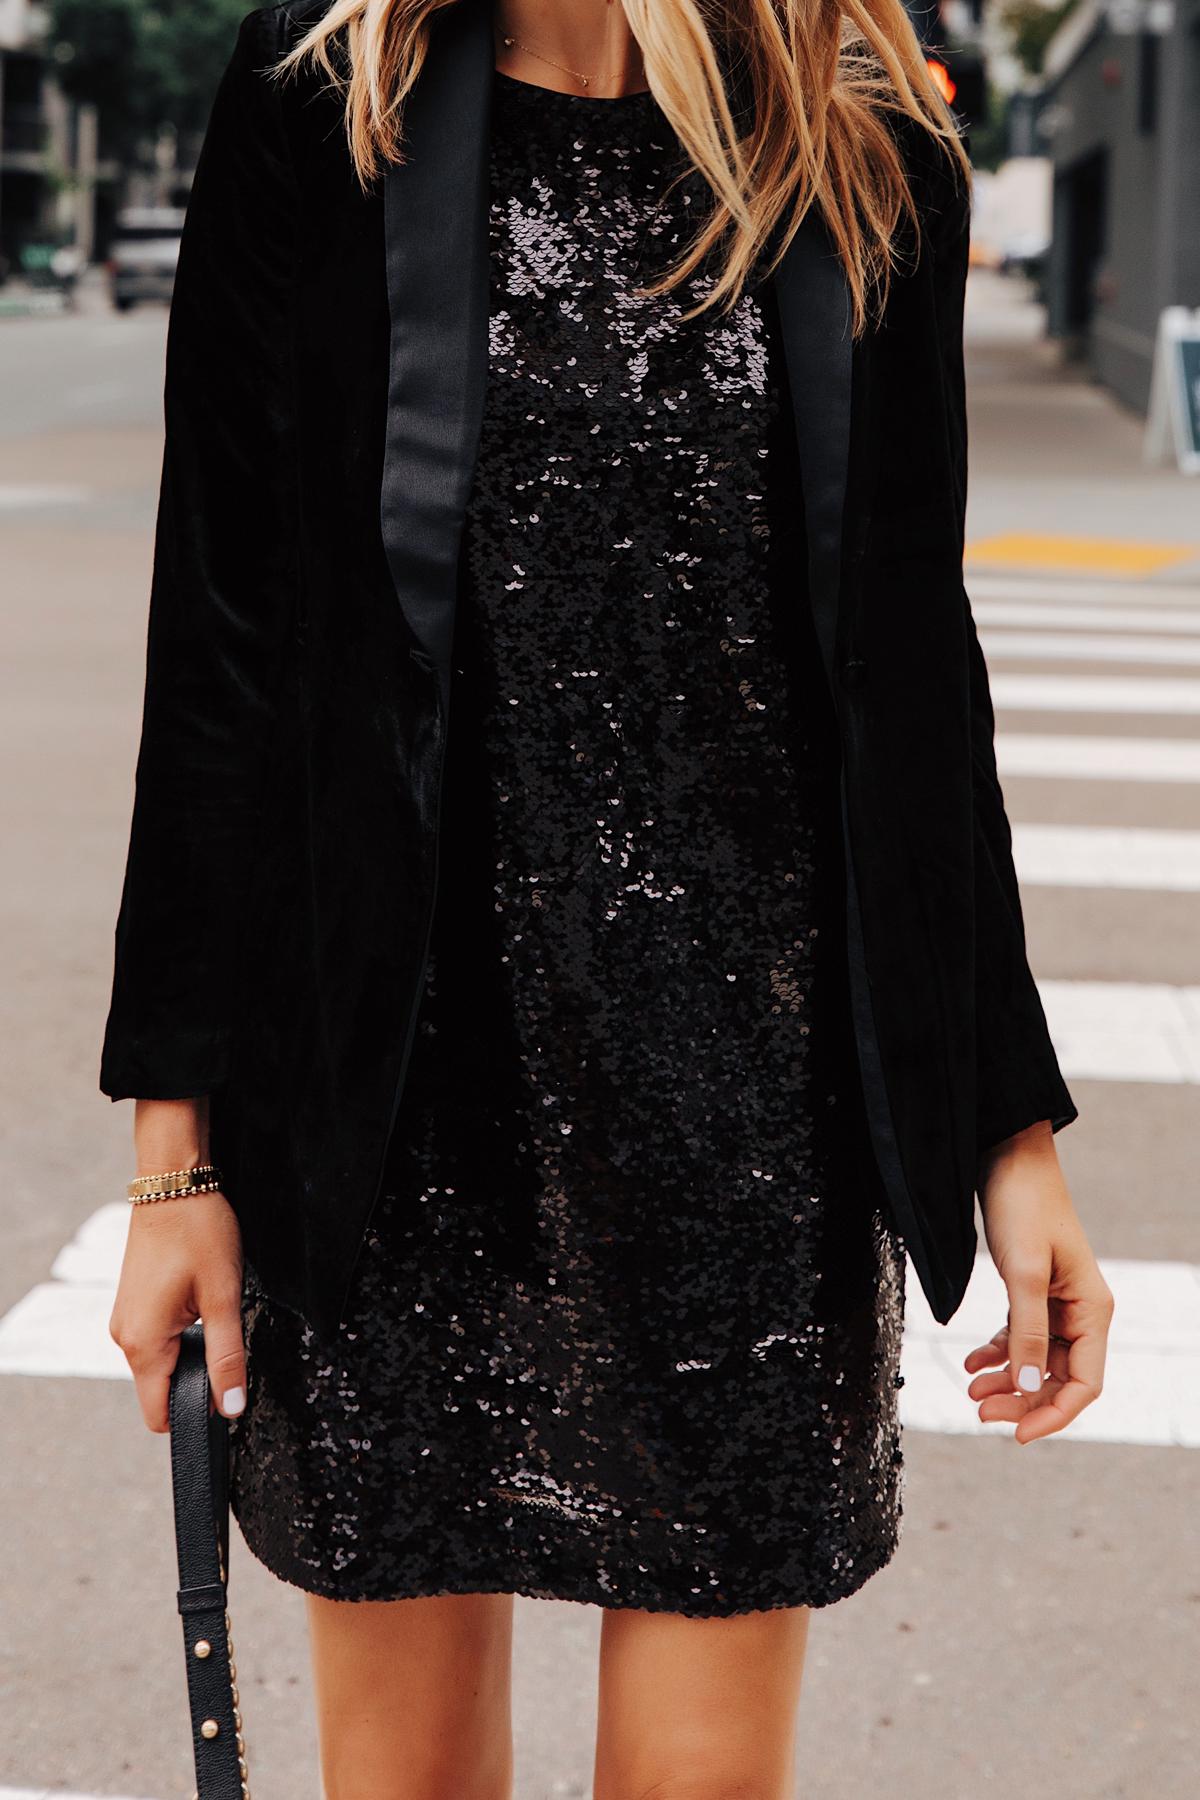 Fashion Jackson Wearing Walmart Black Velvet Blazer Black Sequin Dress 2